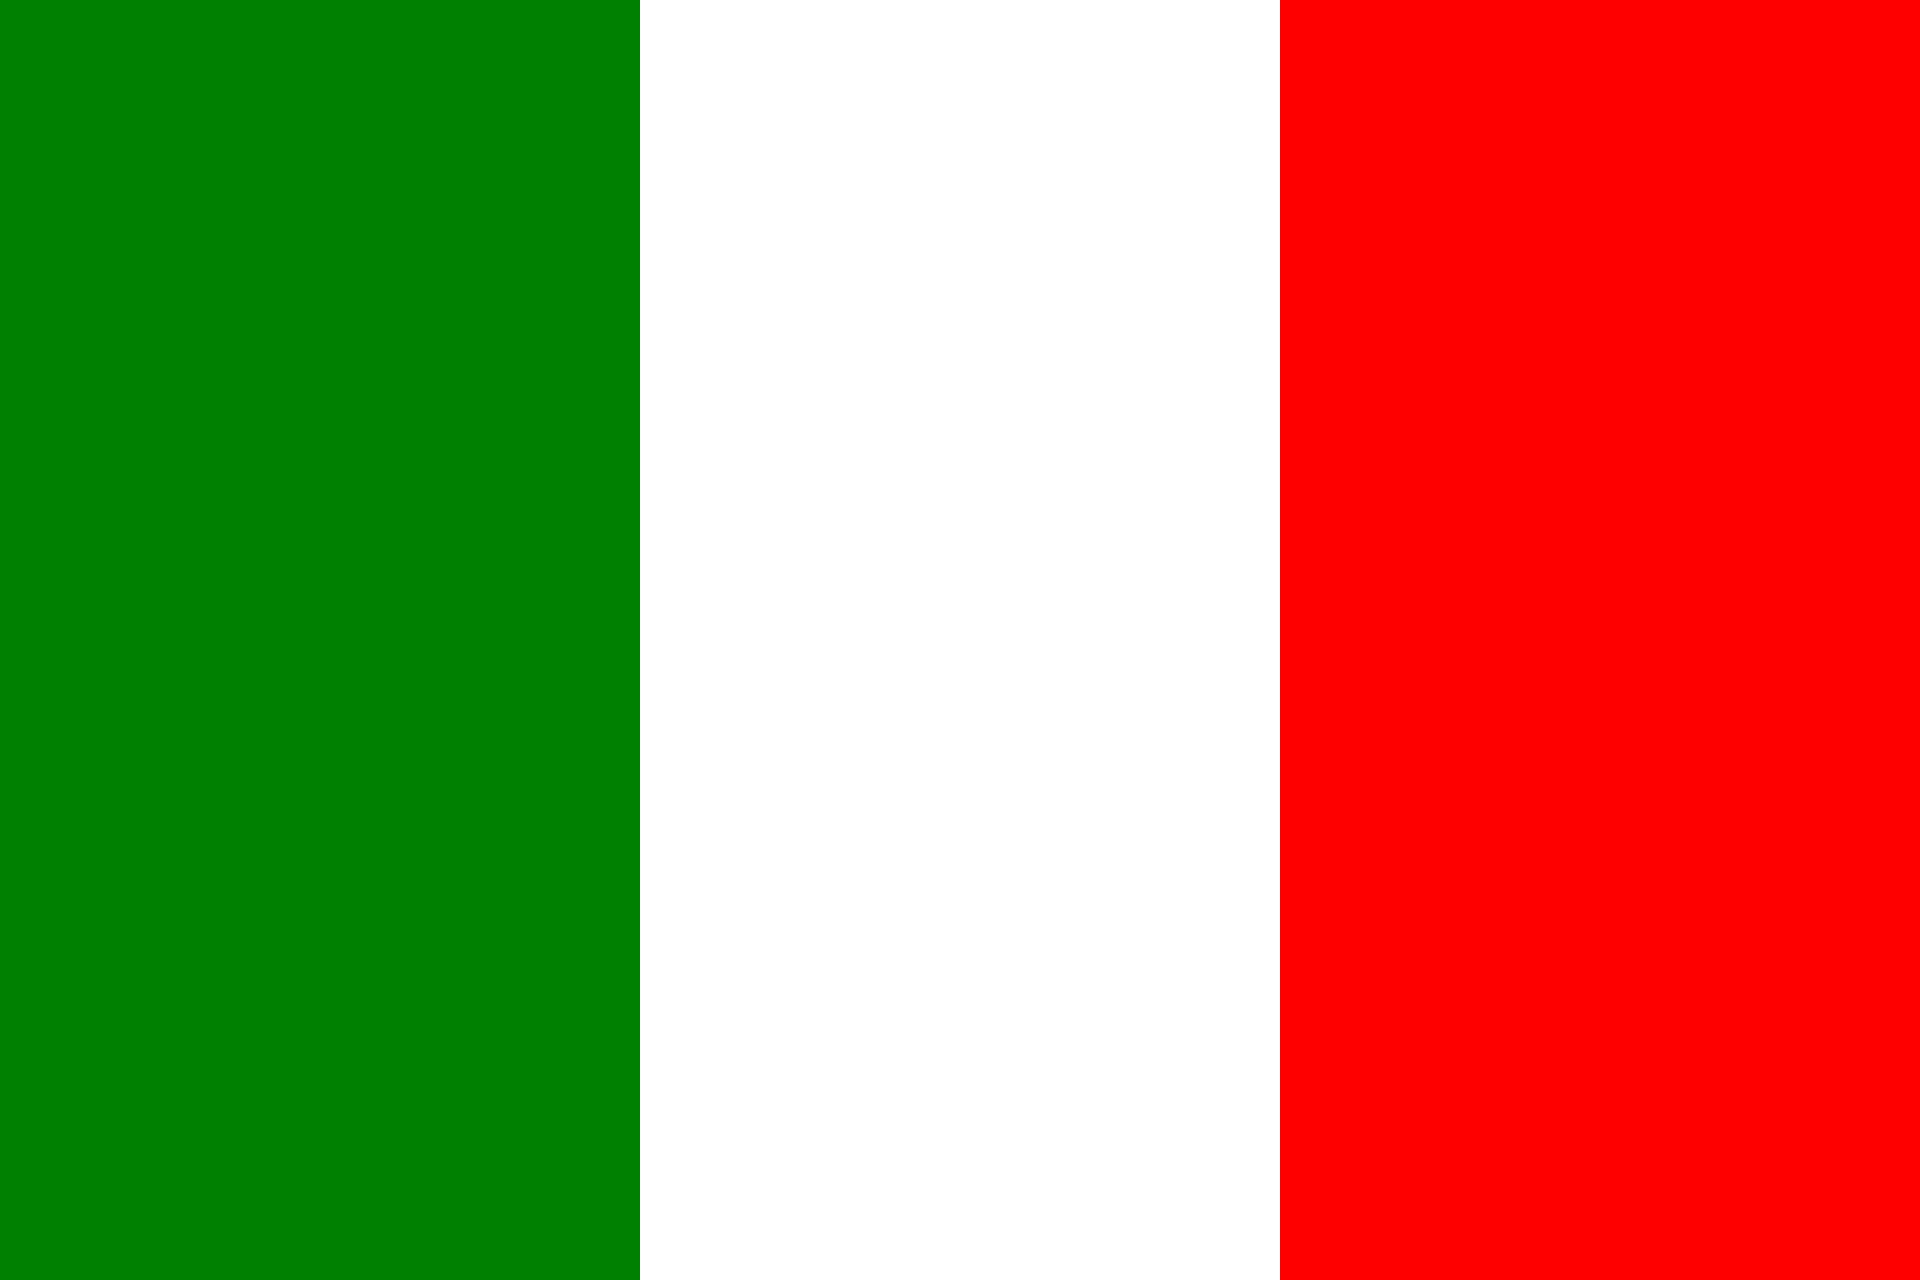 Bild Fahne Italien